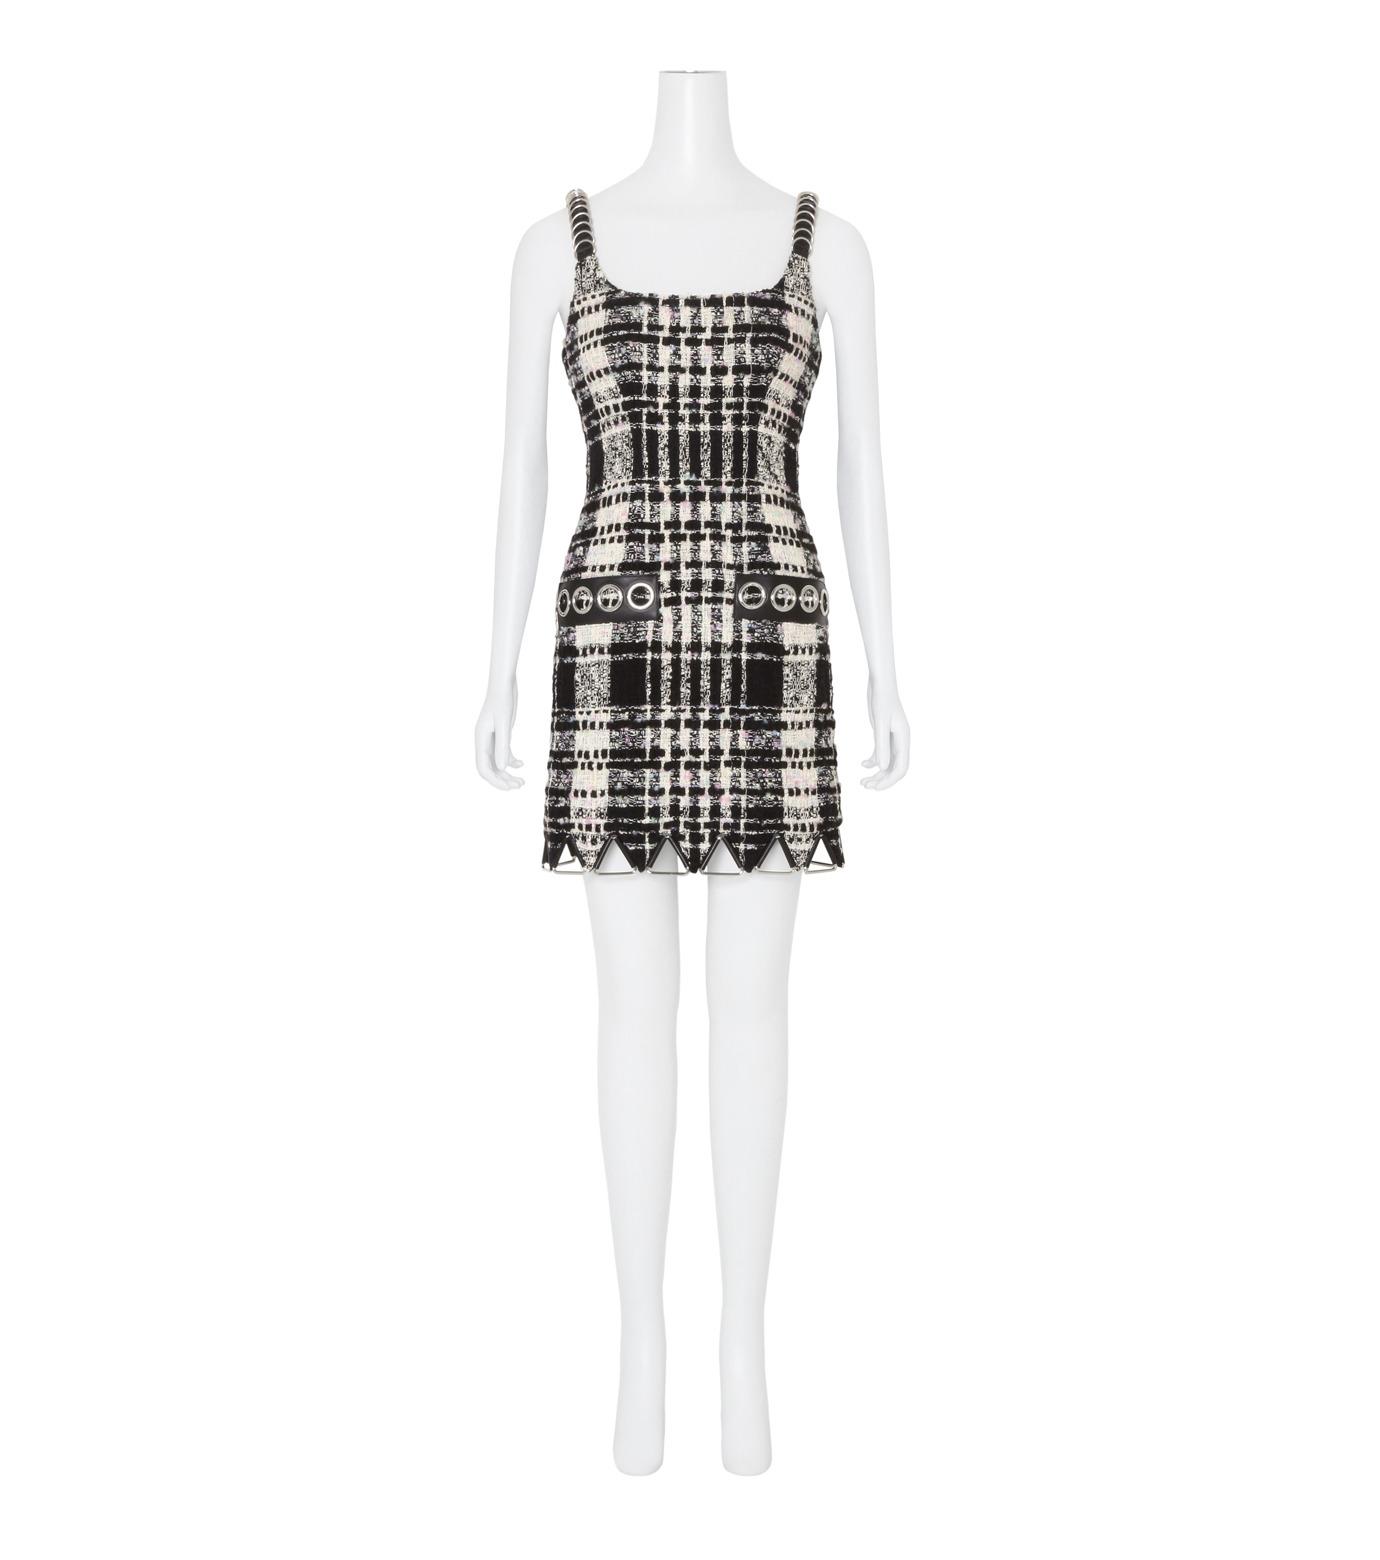 Alexander Wang(アレキサンダーワン)のCami Mini Dress w/Triangle Hardware-BLACK(ワンピース/one piece)-106908F16-13 拡大詳細画像1